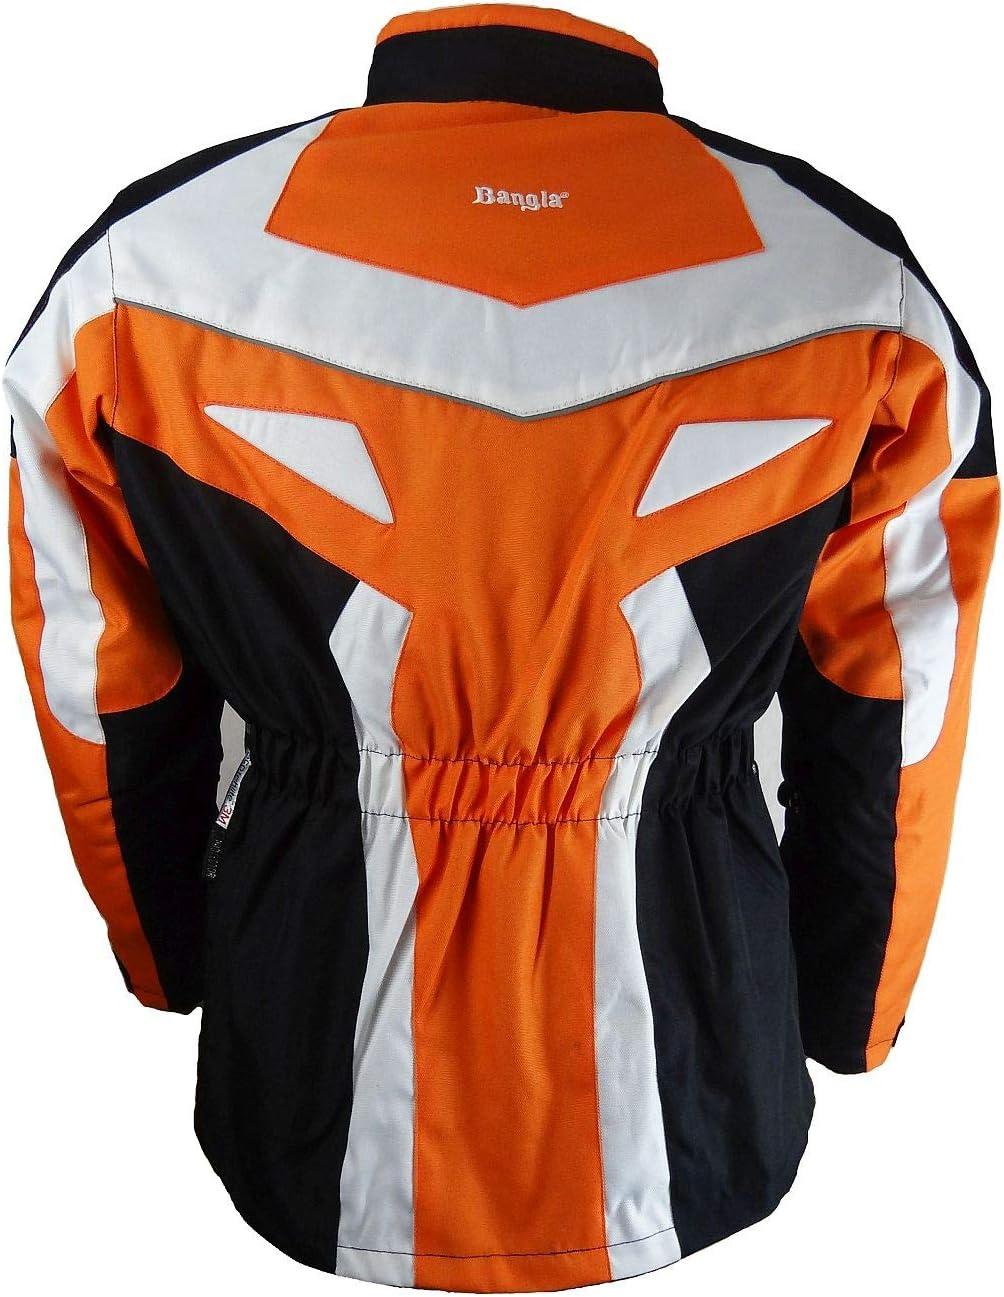 Bangla Kinder Motorradjacke Tourenjacke Textil 1535 Schwarz orange 128